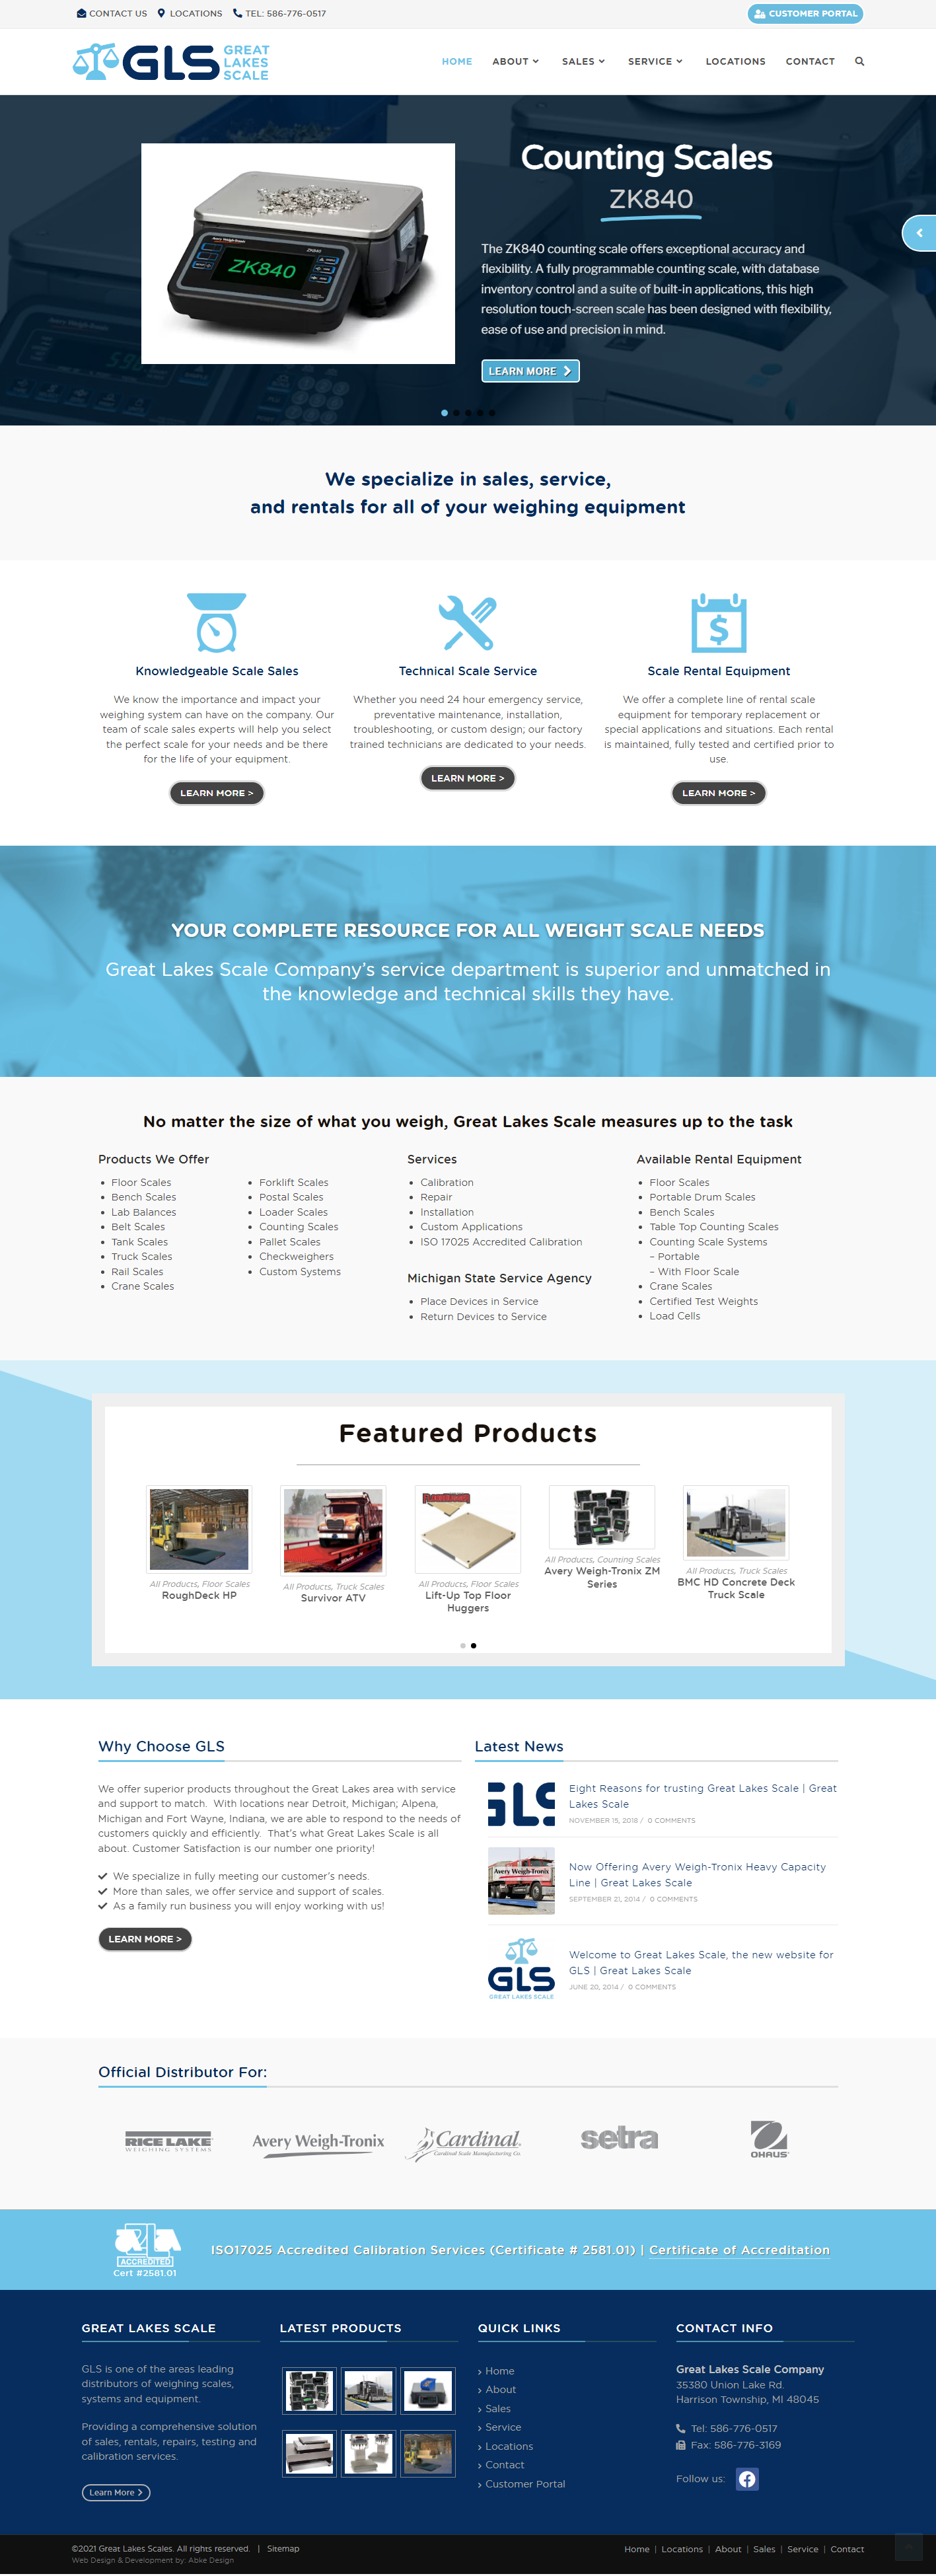 Great Lakes Scale - WordPress Web Design by Abke Design